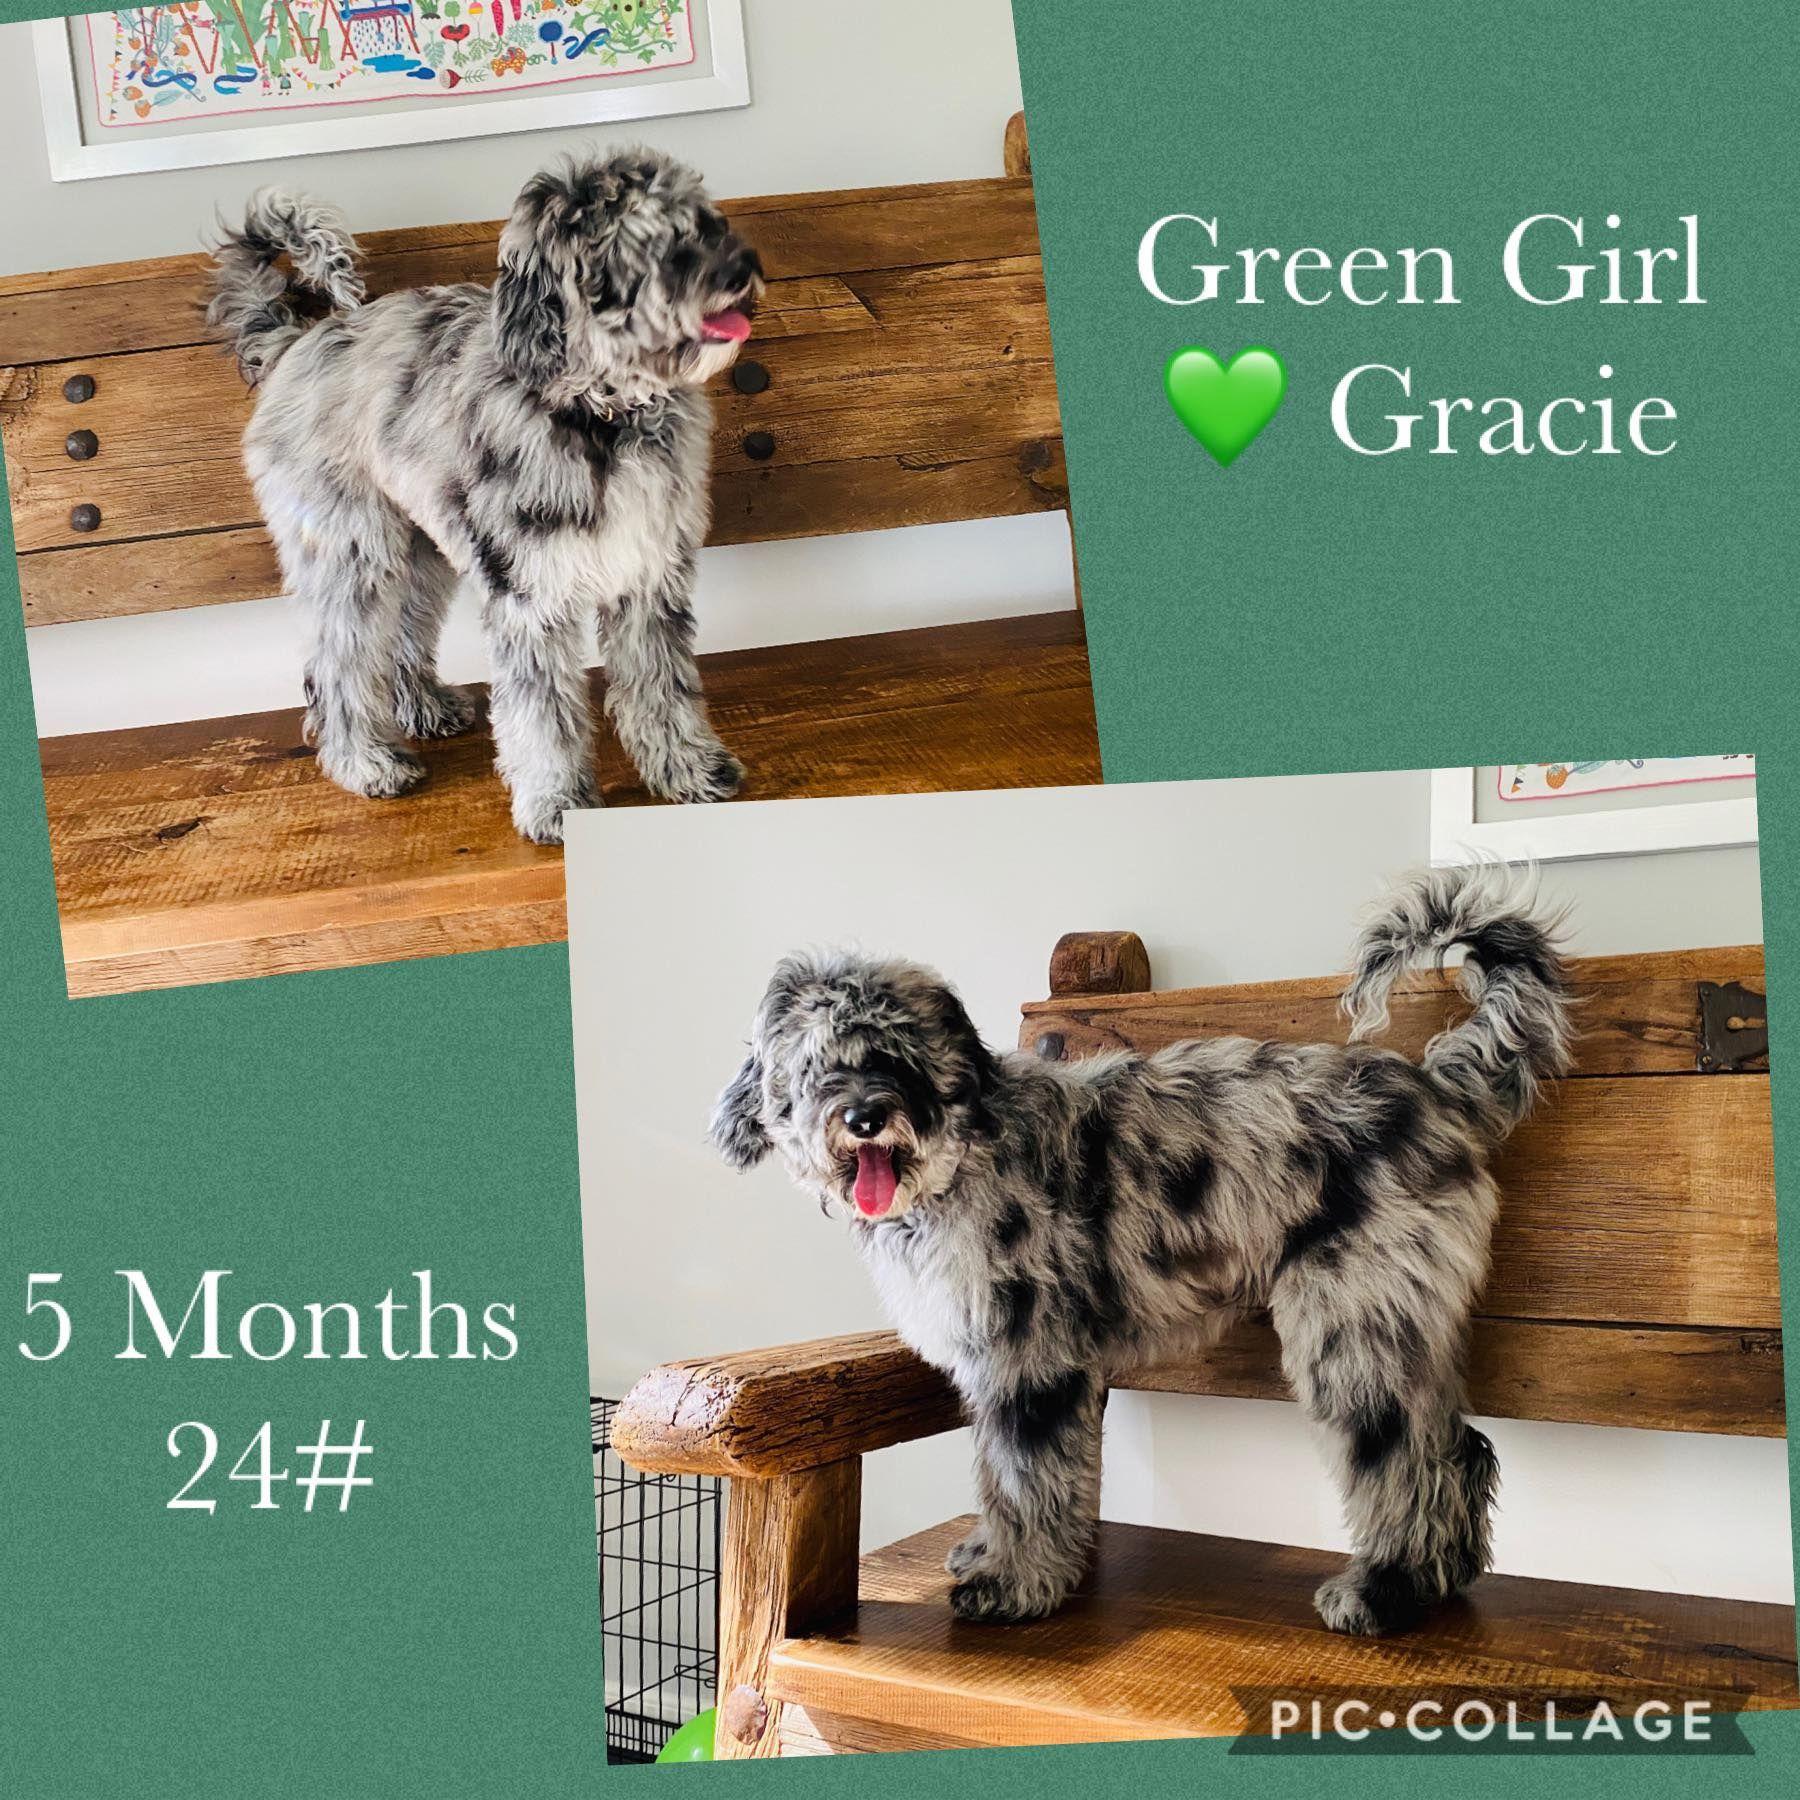 Mini Merle Sheepadoodles In 2020 Sheepadoodle Goldendoodle Puppies For Sale